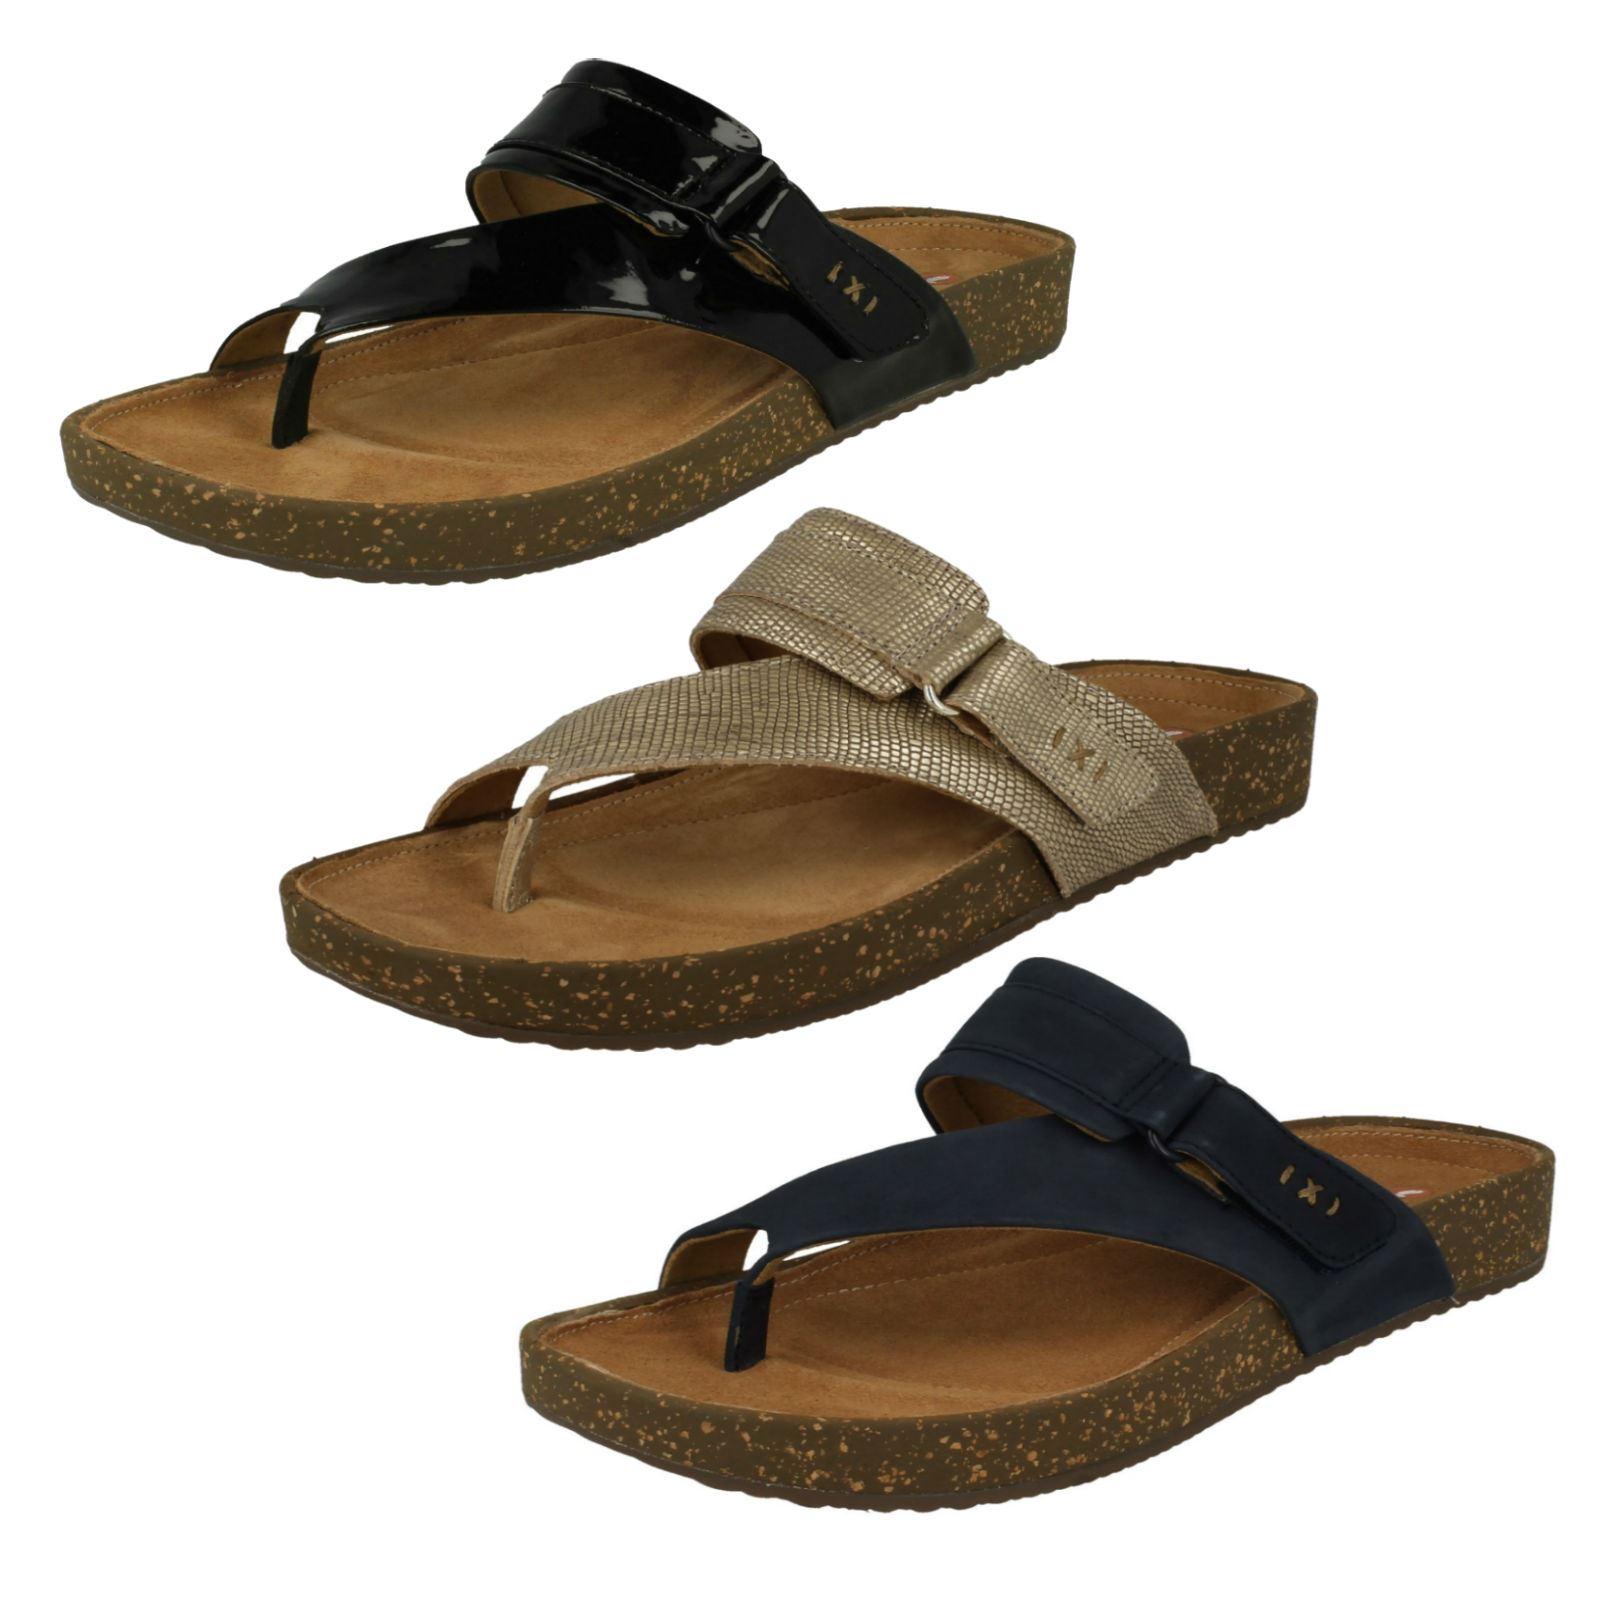 c08223b7bd7 Details about Ladies Clarks Rosilla Durham Flip Flop Sandals